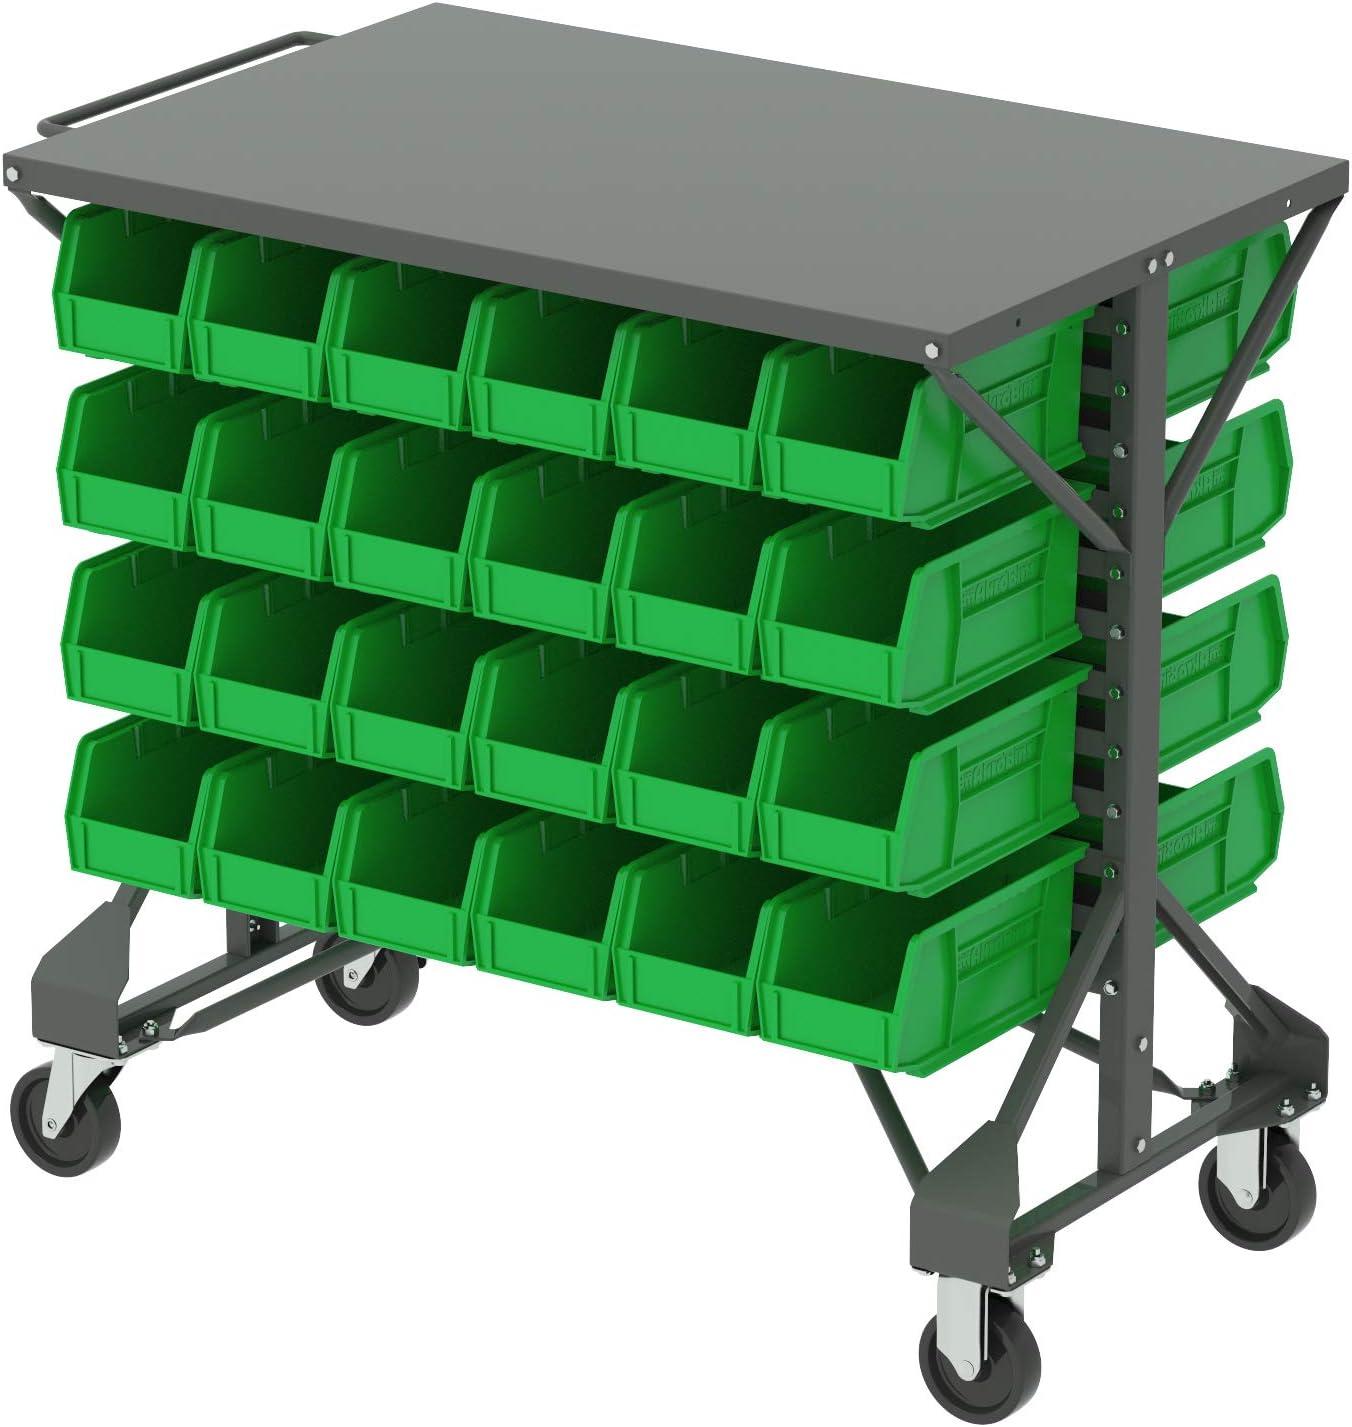 Akro-Mils 30812 Powder Coated Steel Mobile Bin Cart with Steel Worktop 38-1//2-Inch Wide by 24-Inch Deep by 36-1//2-Inch High